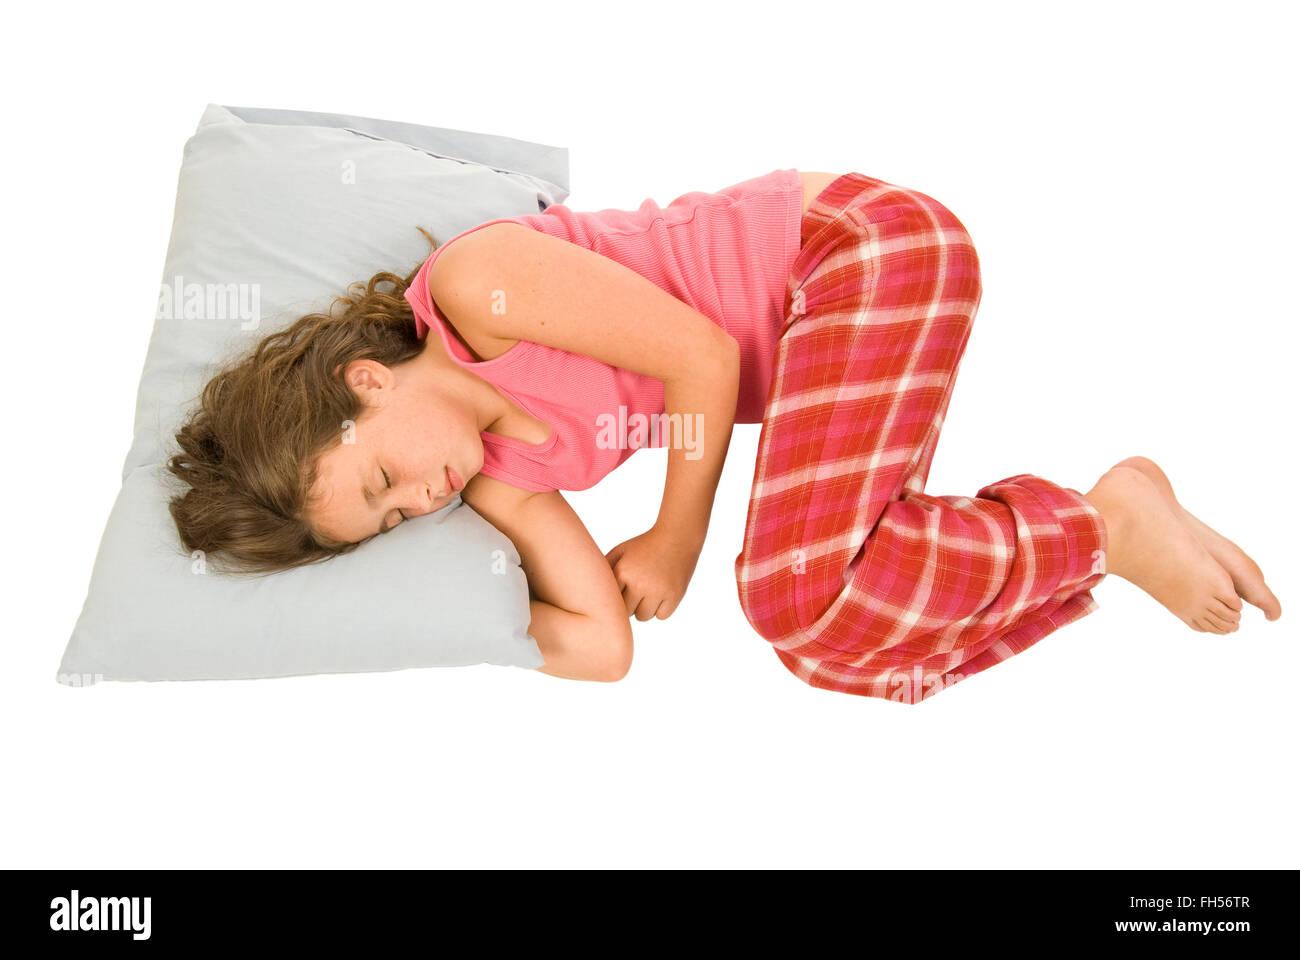 Little Girl Sleeping In Fetal Position - Stock Image